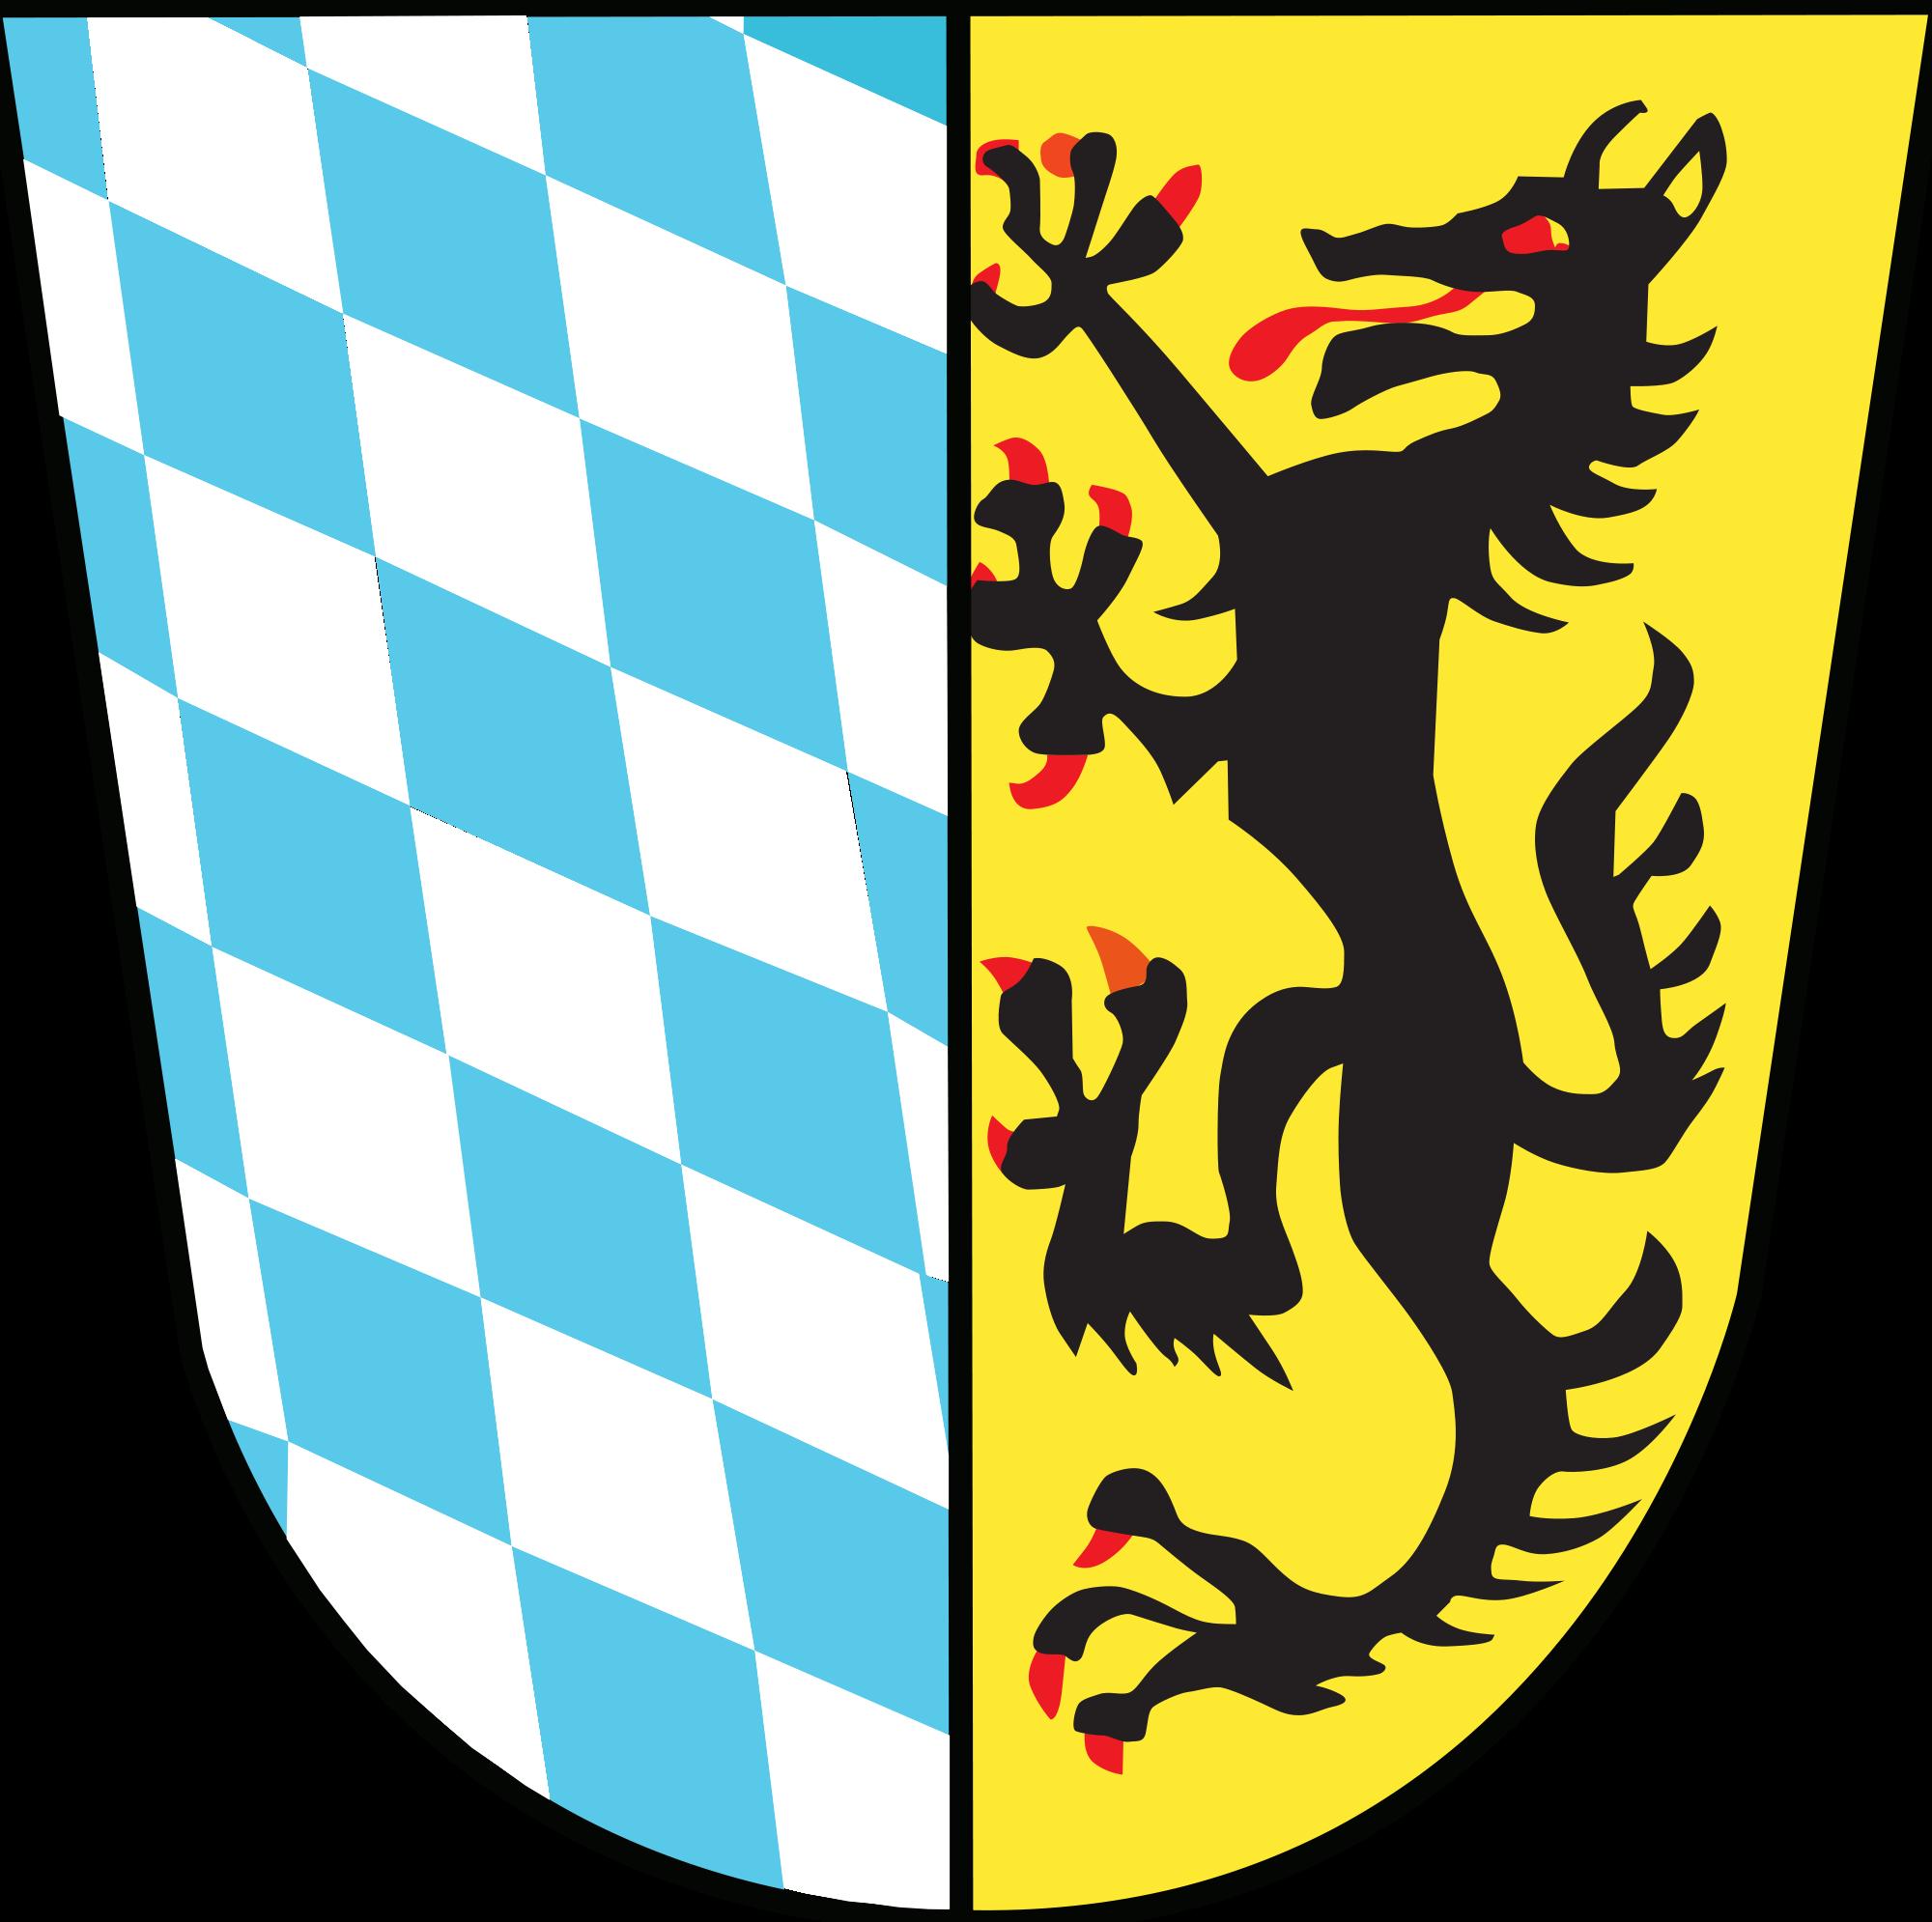 File:Wappen Bad Reichenhall.svg.